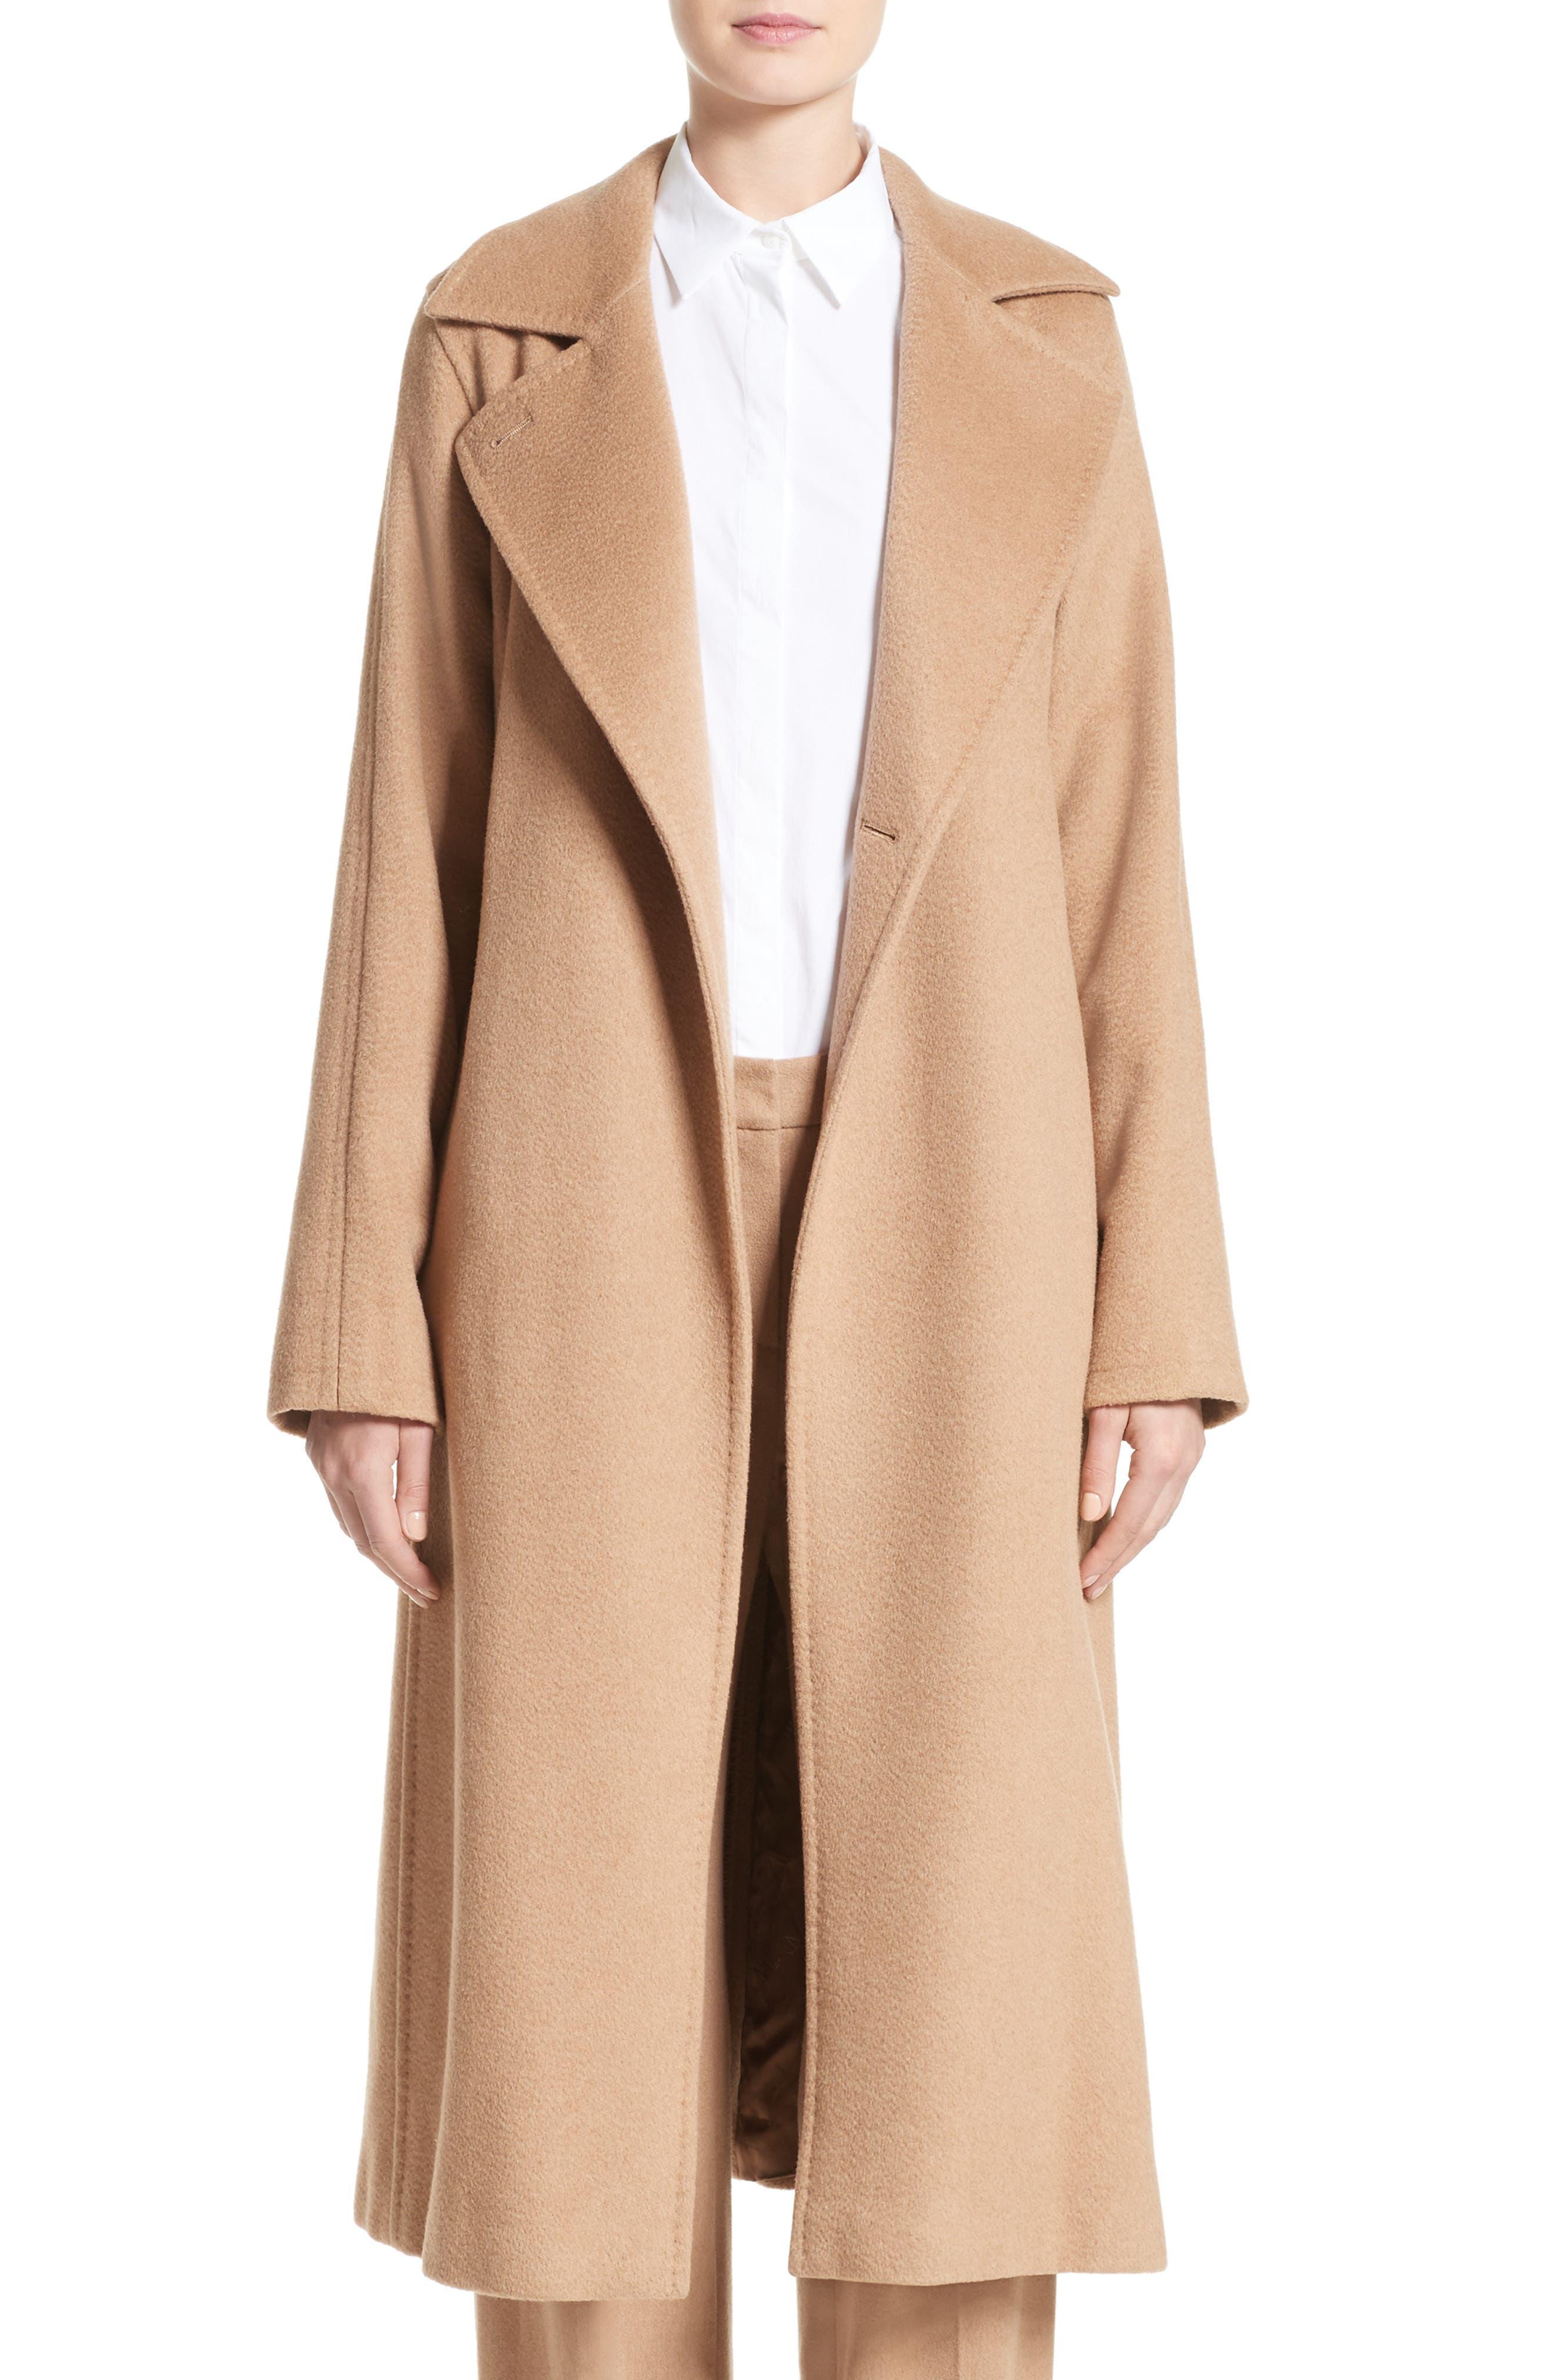 Main Image - Max Mara 'Manuela' Camel Hair Coat